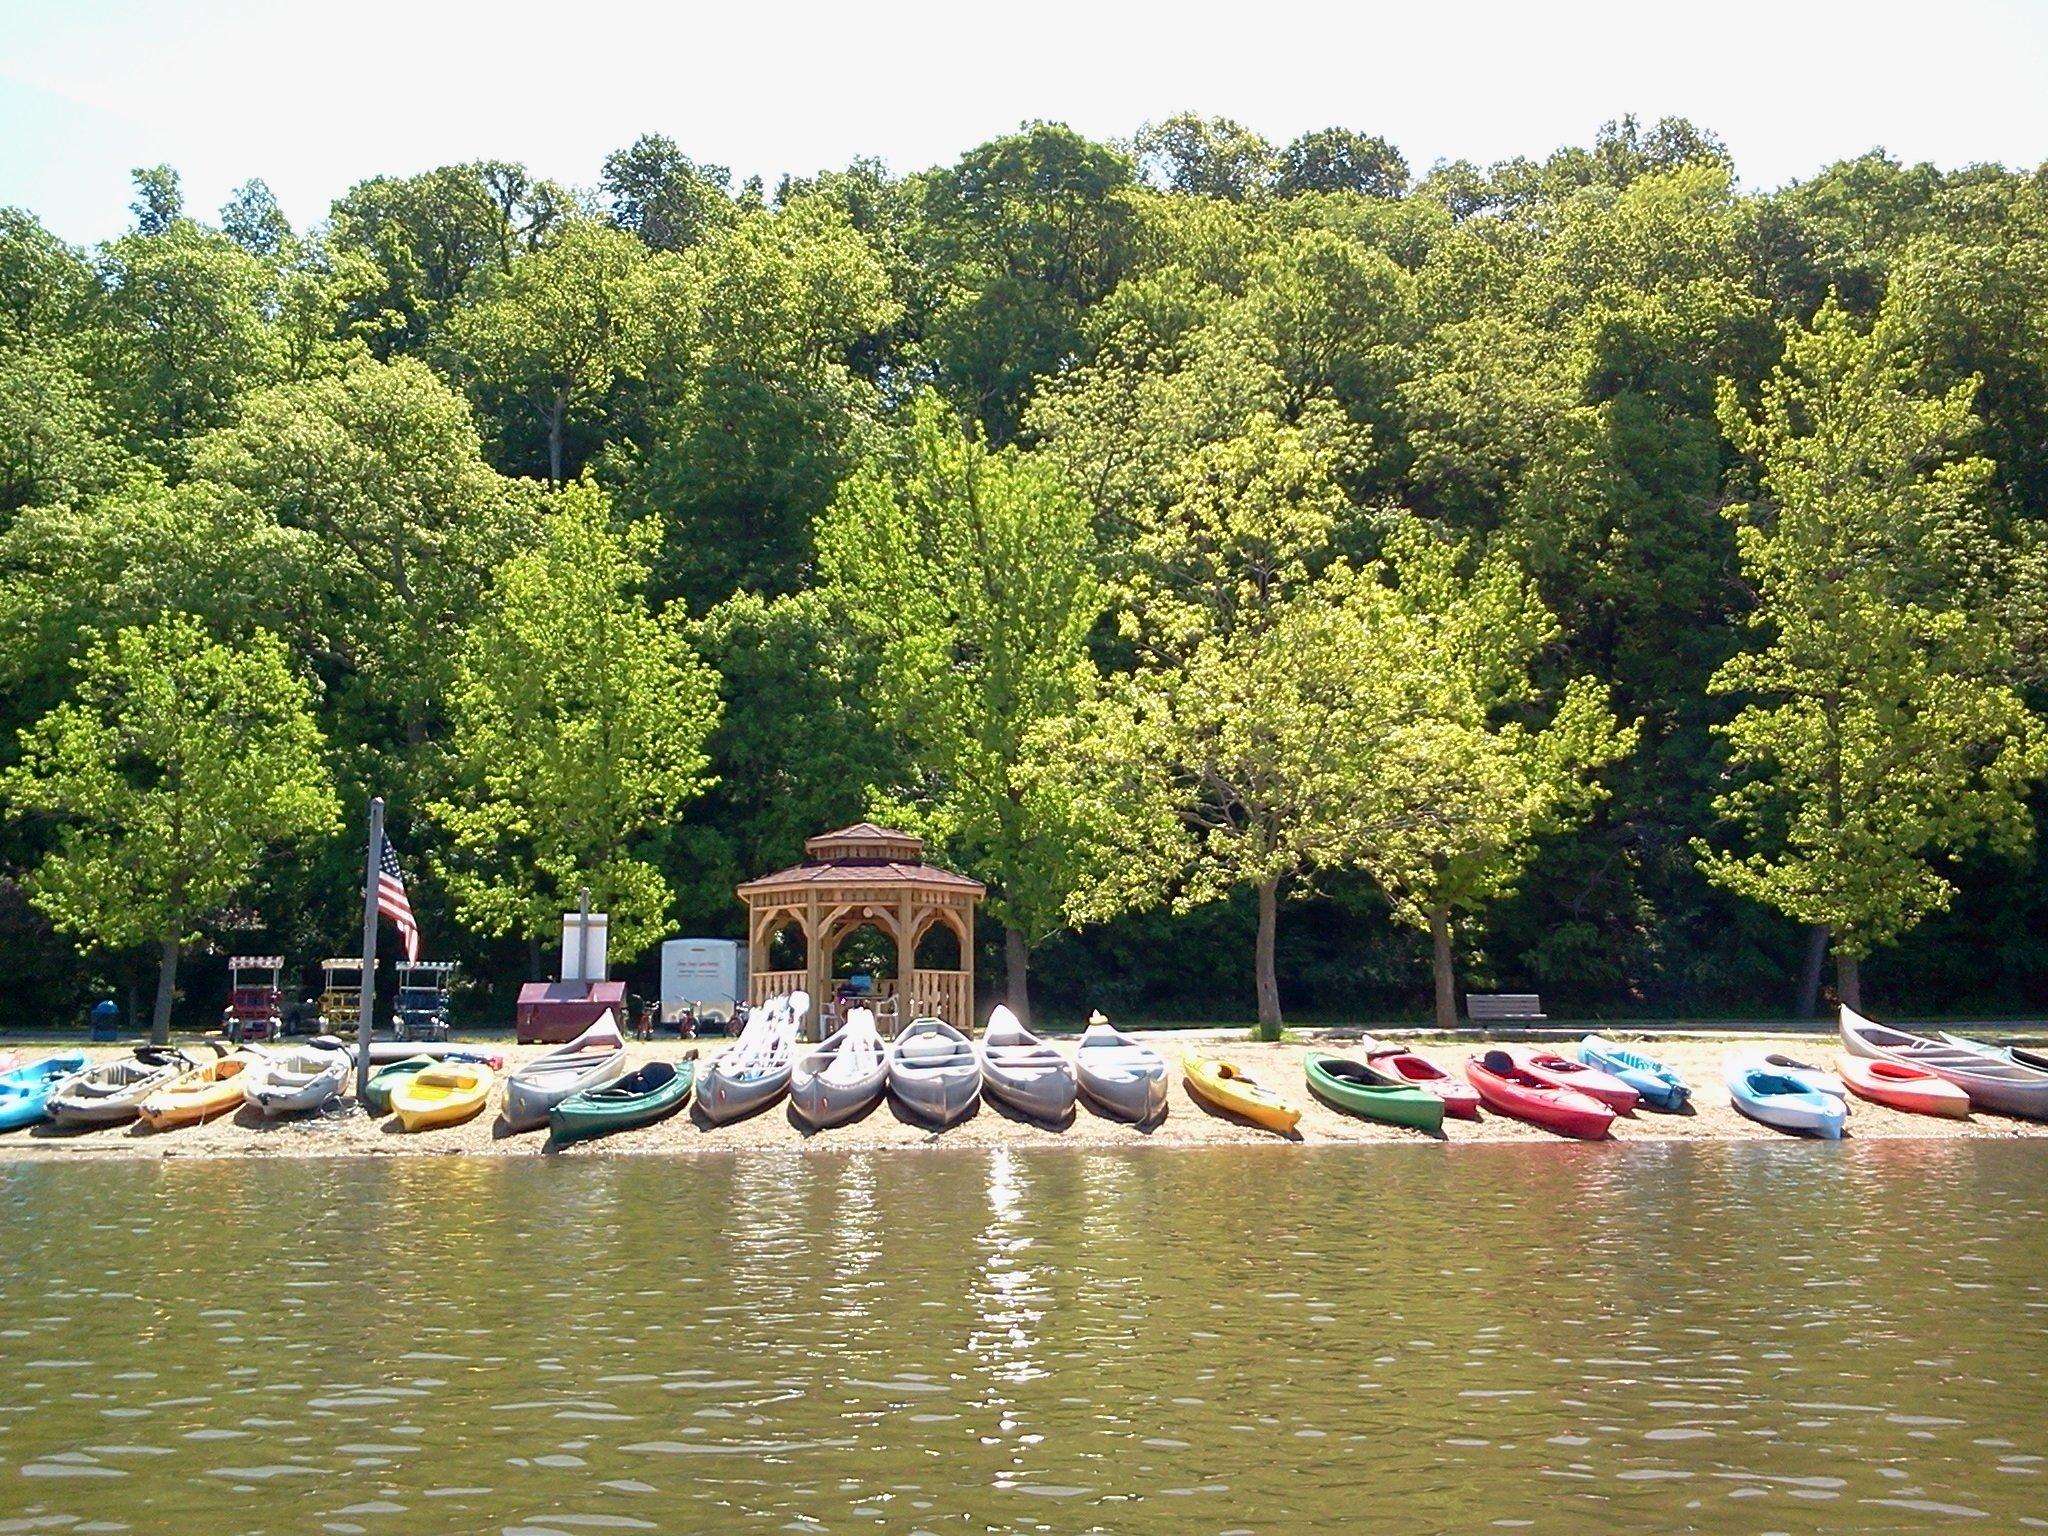 10 Spectacular Fun Date Ideas In St. Louis creve coeur lake rentals stl pinterest lakes bon voyage and 1 2020